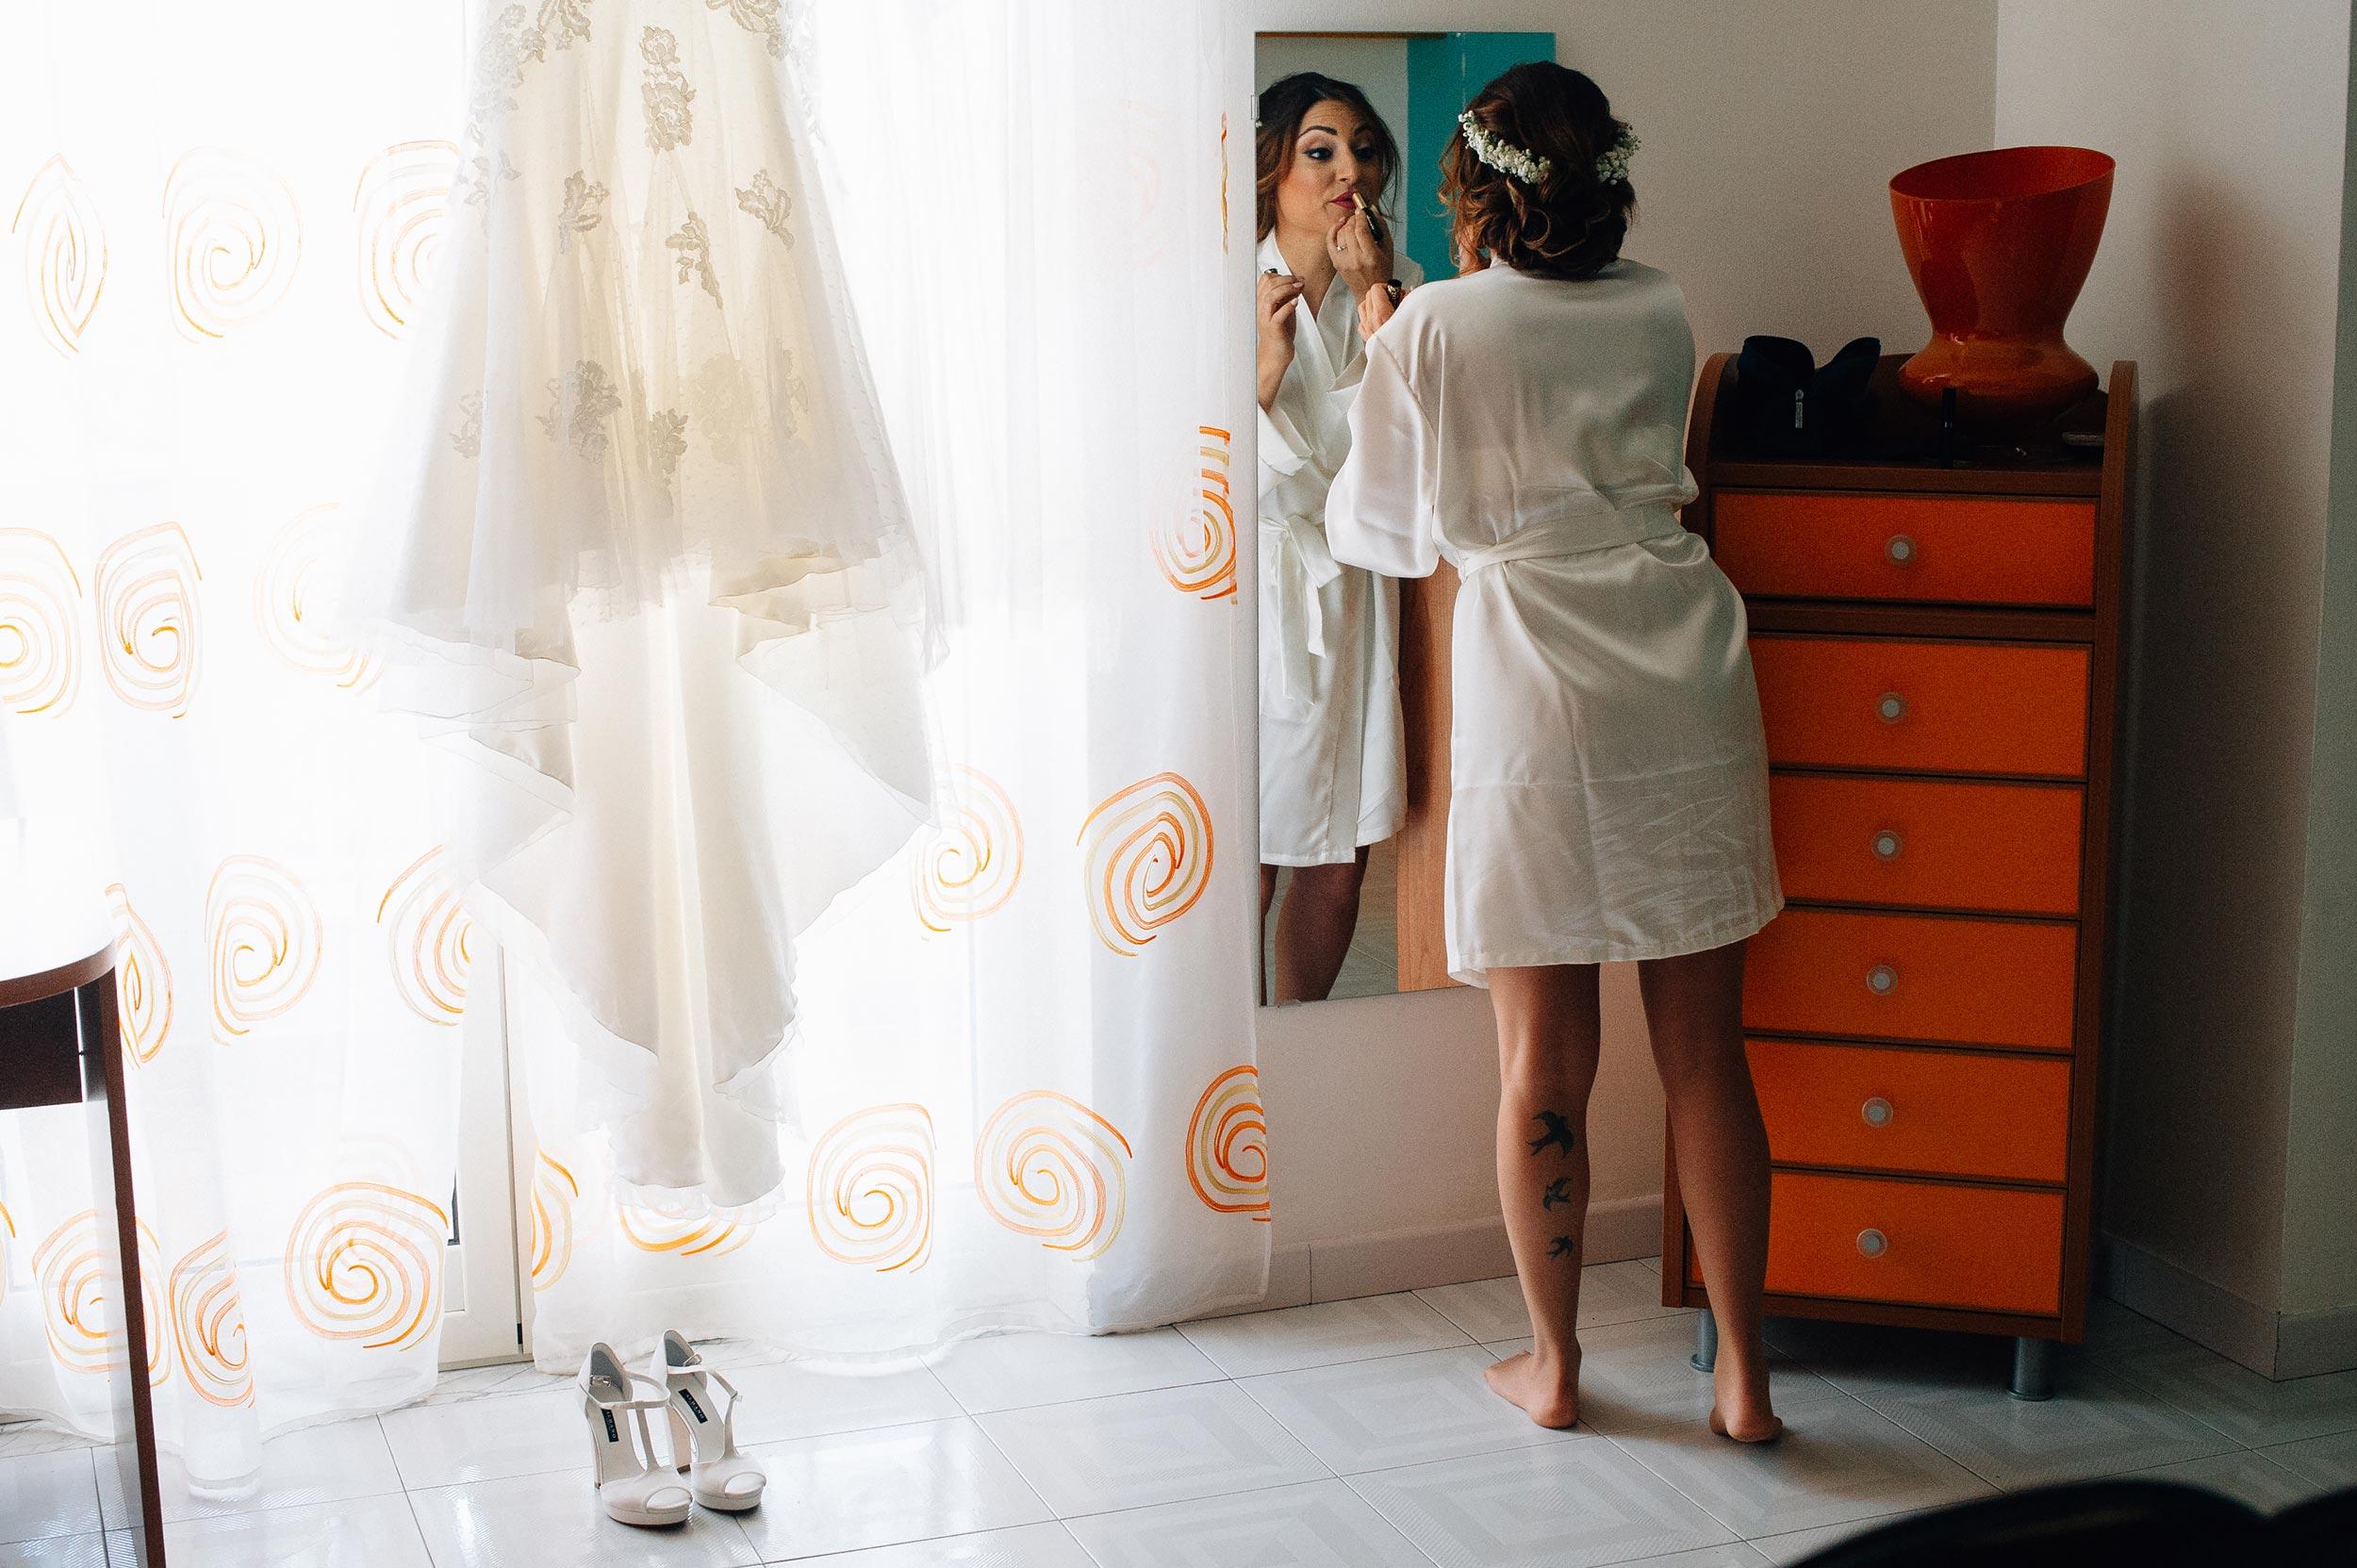 2016-Claudio-Teresa-Naples-Wedding-Photographer-Italy-Alessandro-Avenali-17.jpg